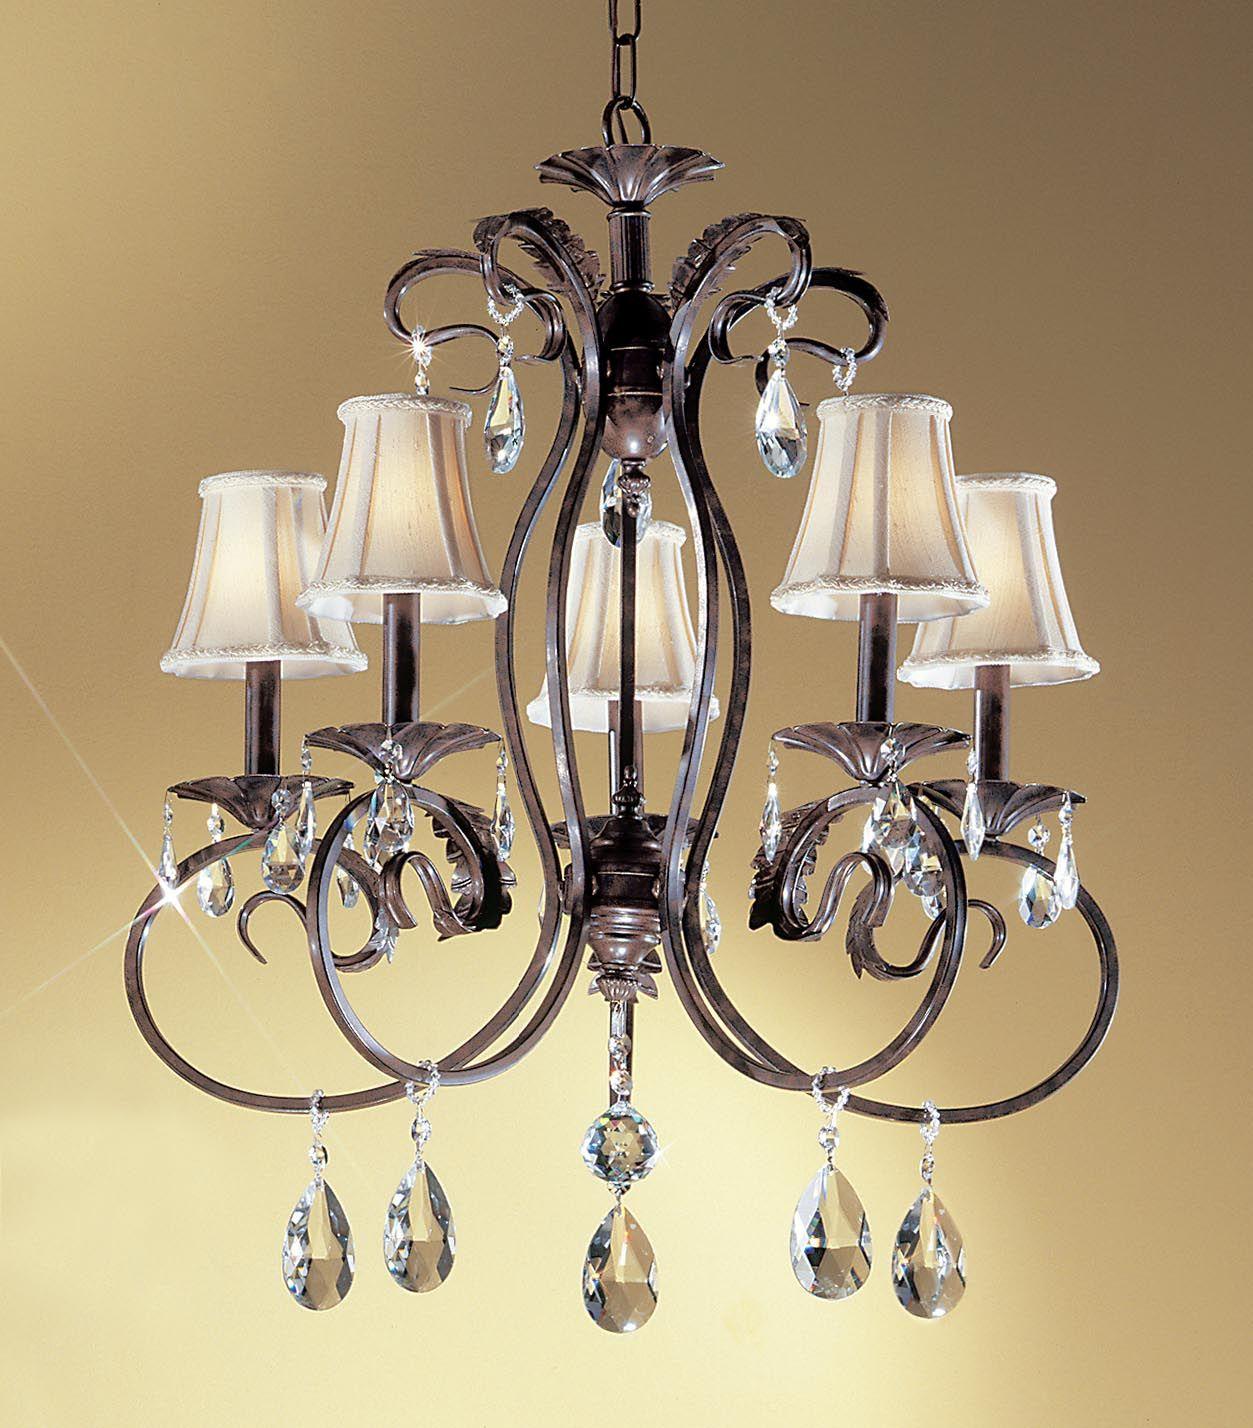 C135 68315 eb by classic lighting manilla ii 5 lights chandelier c135 68315 eb by classic lighting manilla ii 5 lights chandelier english bronze finish arubaitofo Gallery